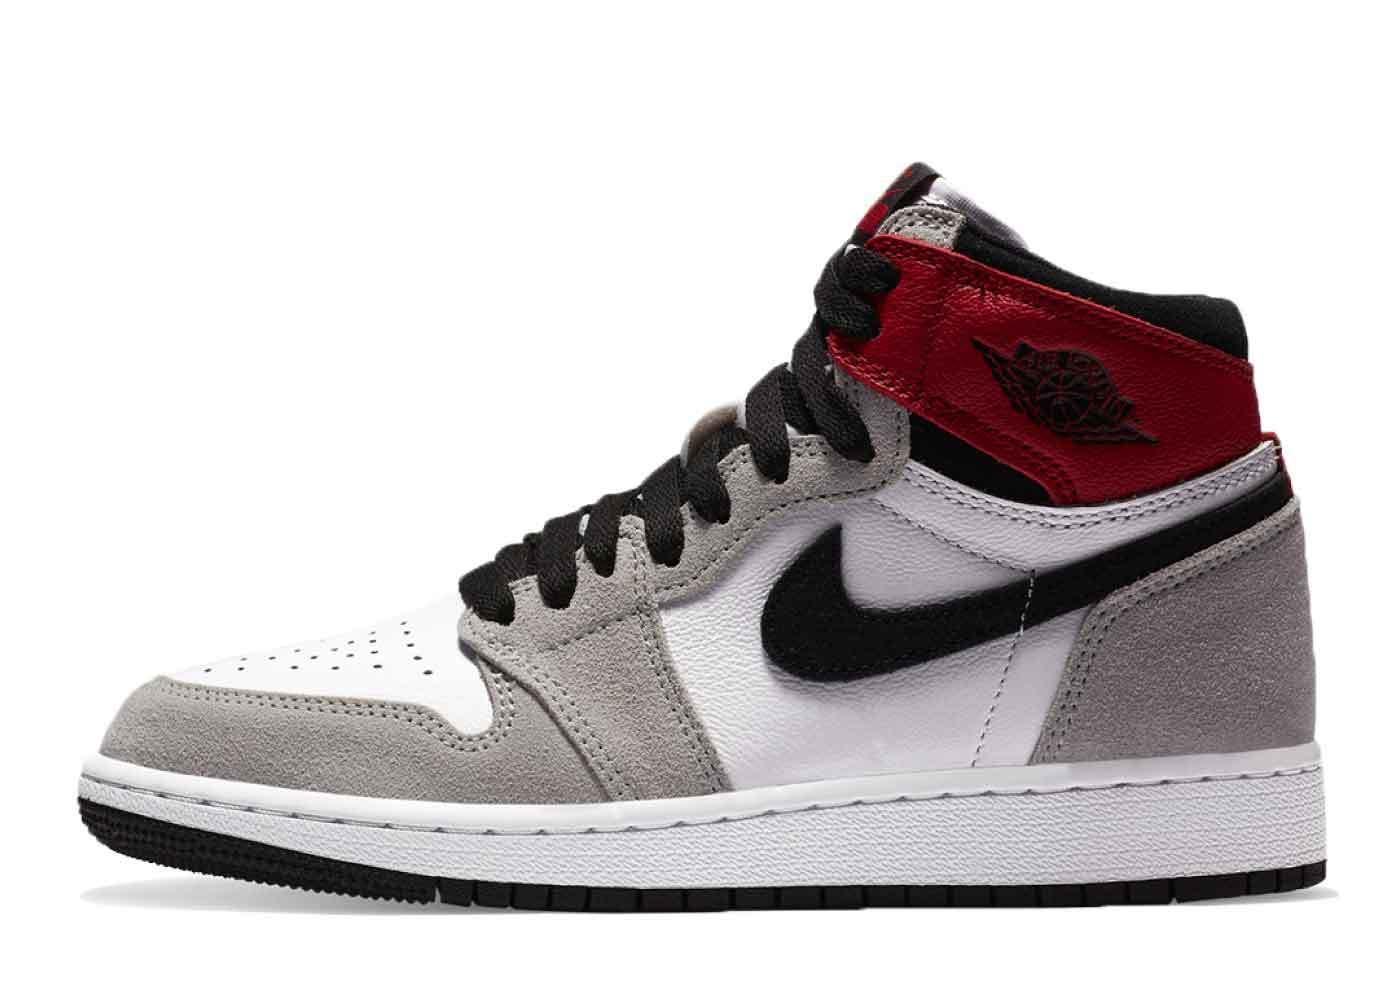 Nike Air Jordan 1 Retro High OG Light